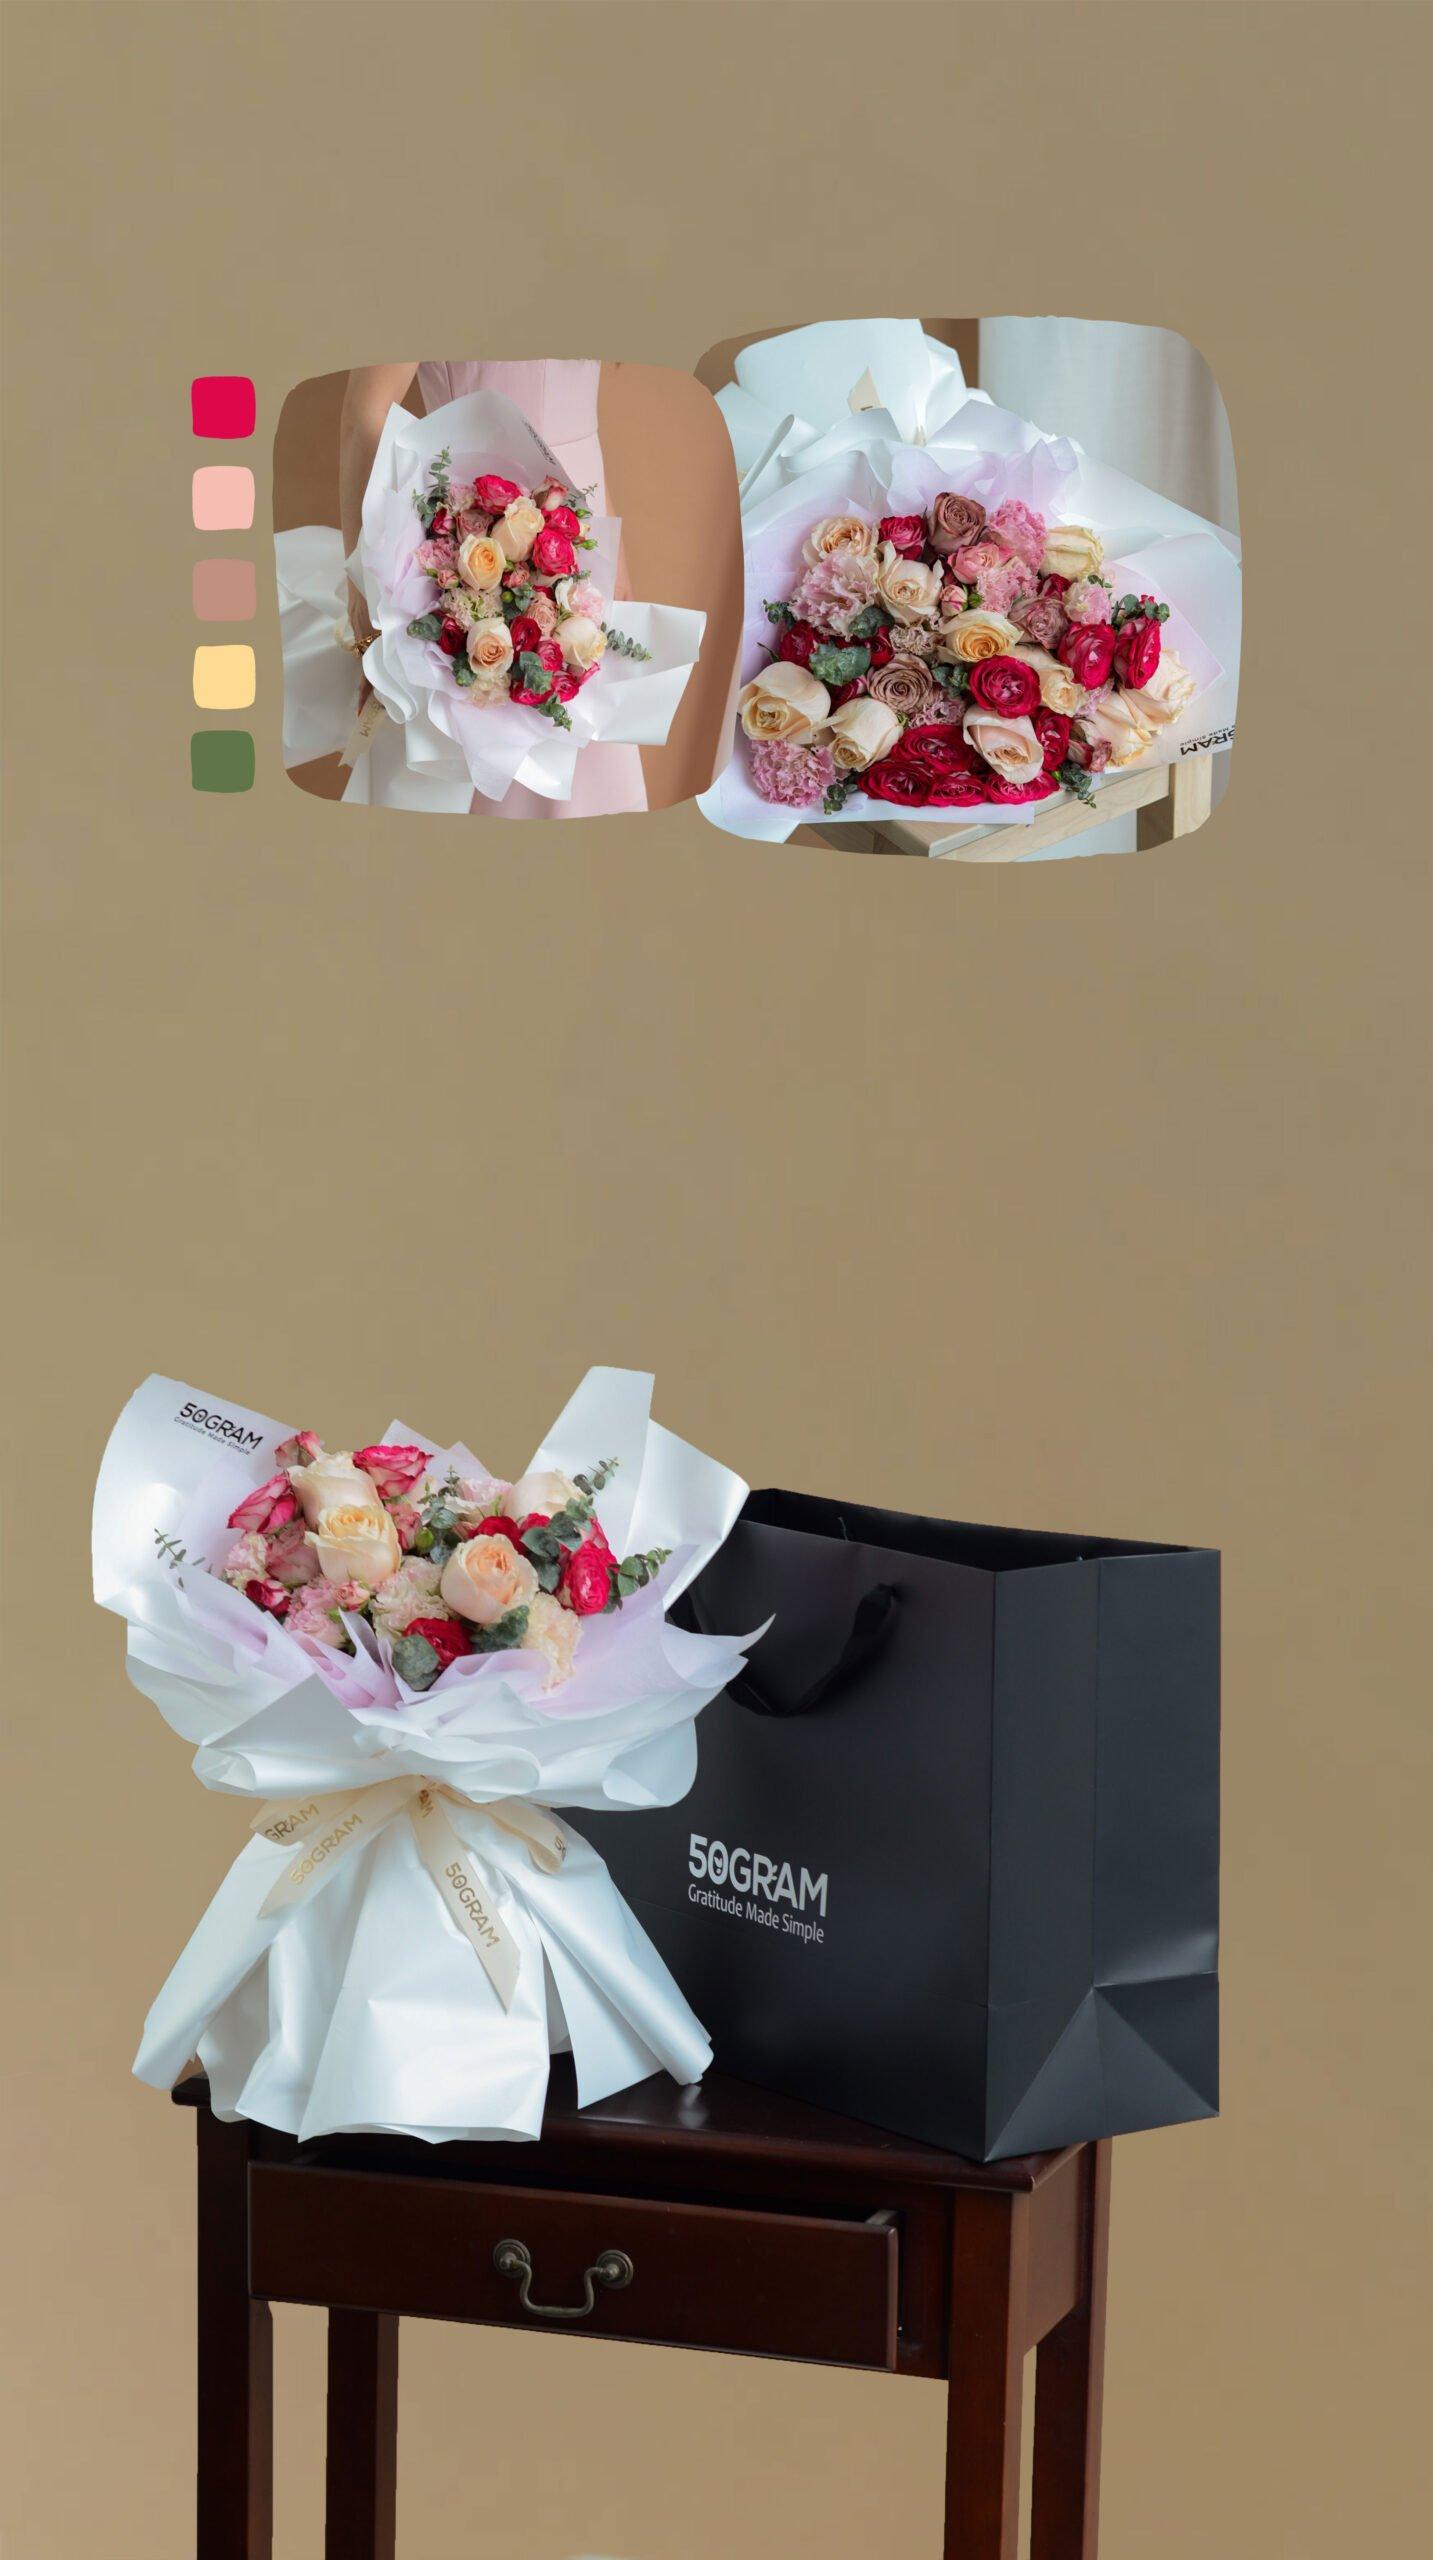 Packaging-Display-&-Color-Palette